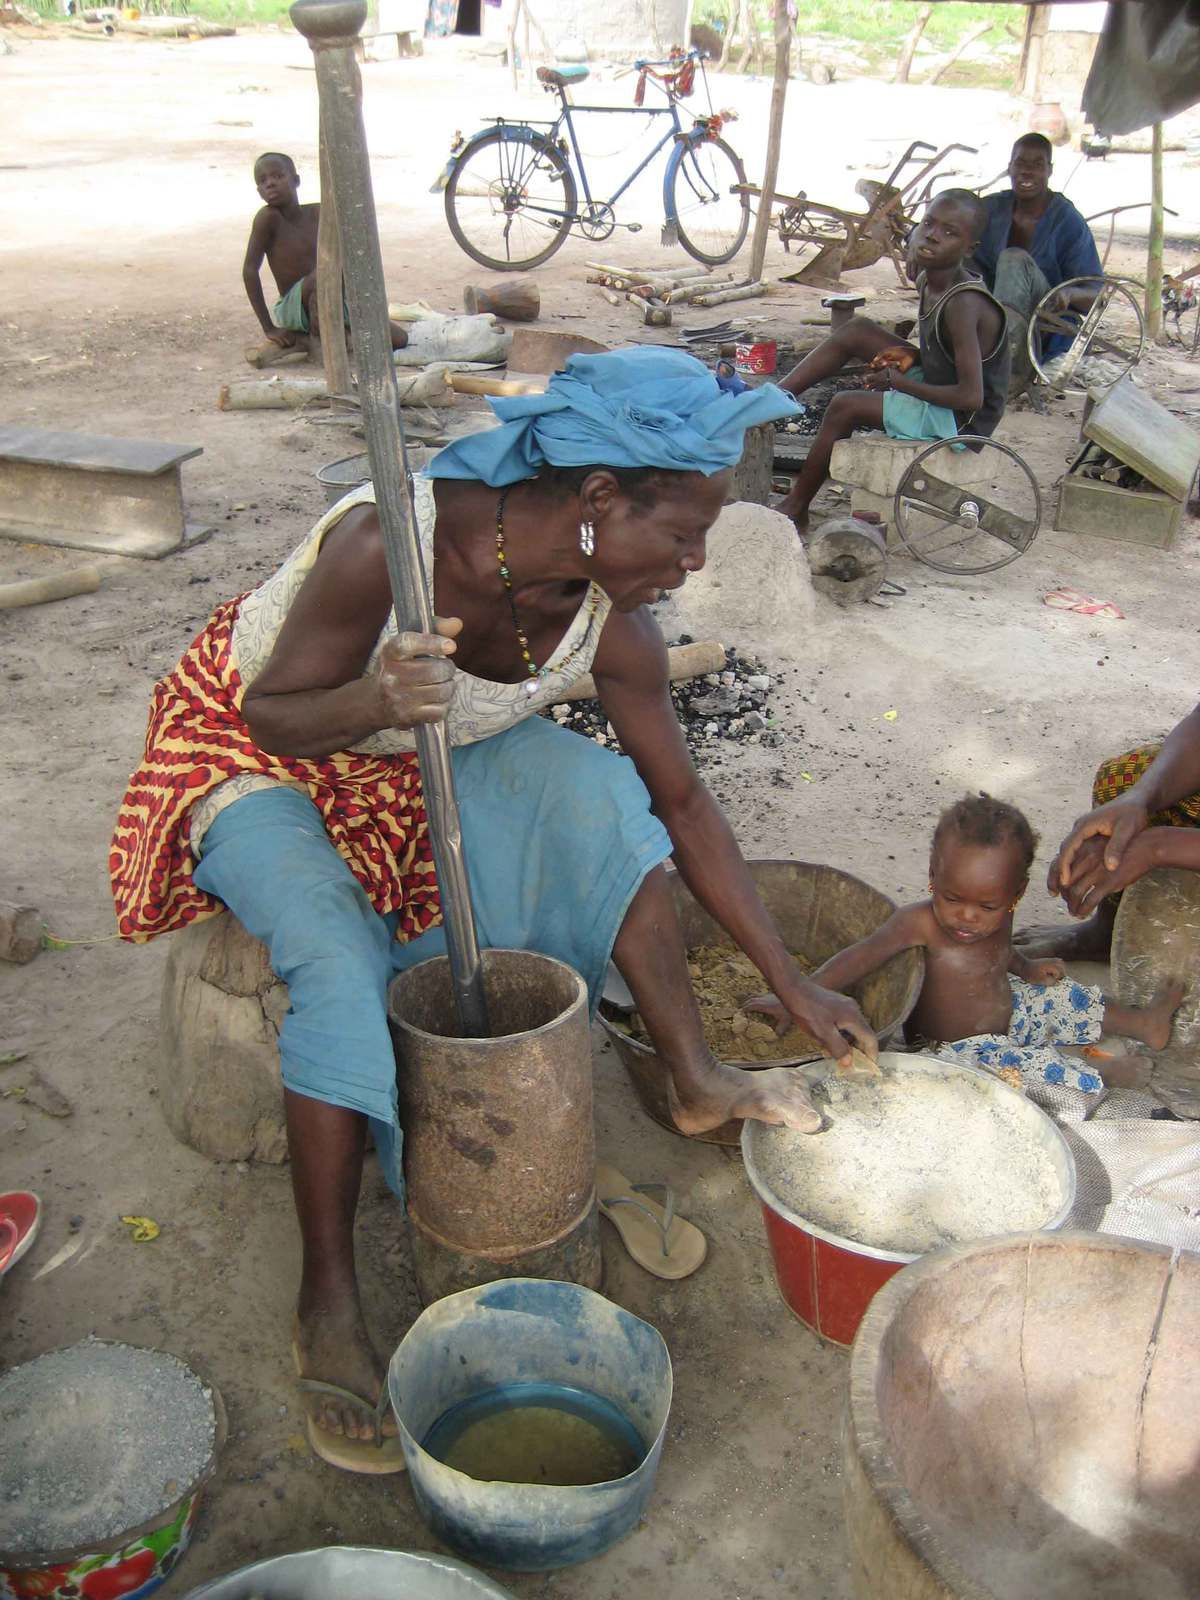 Mujer de Guinea preparando harina